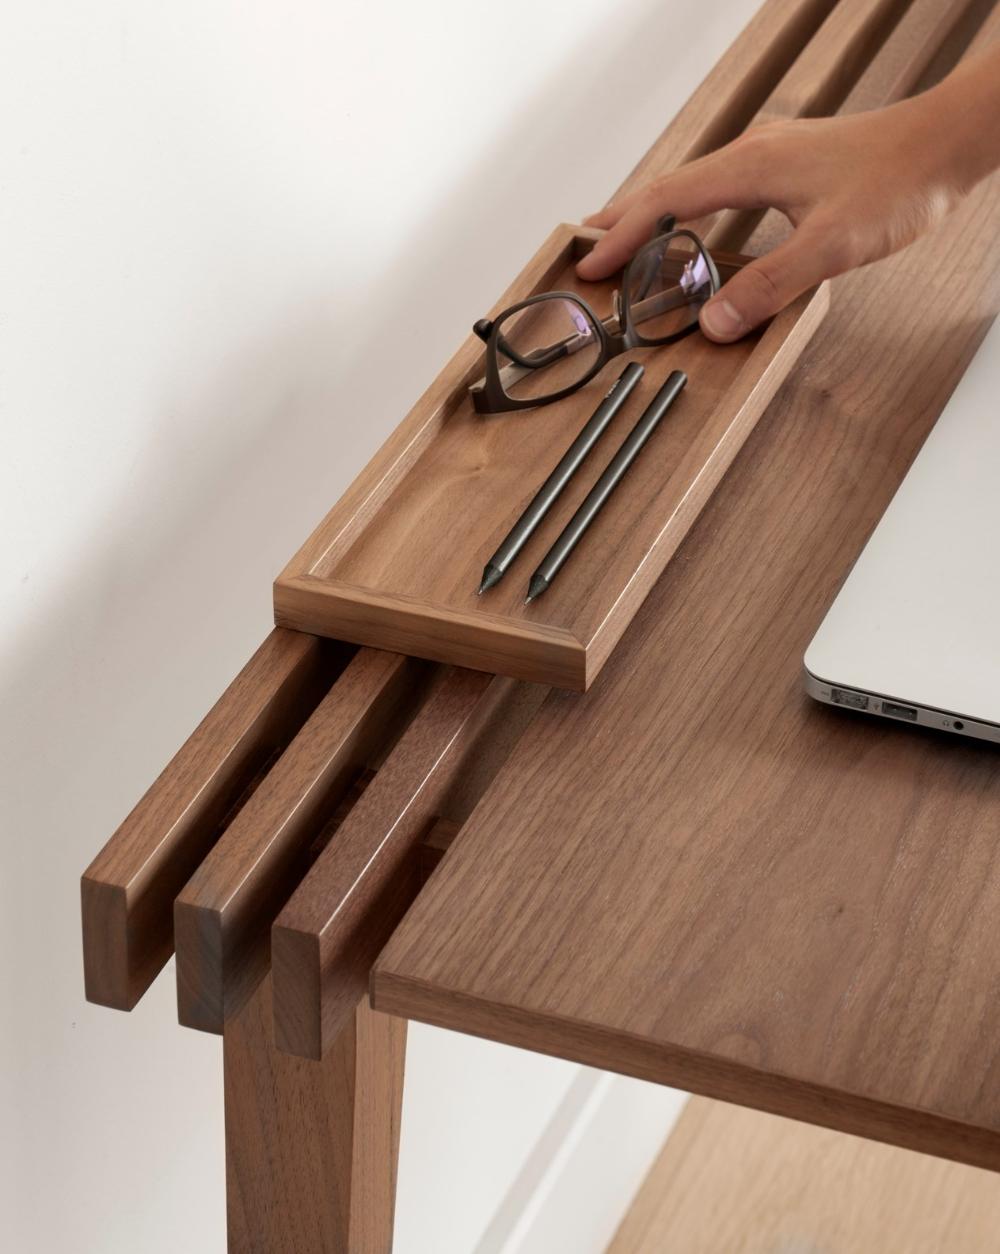 Joined Jointed Clean And Measured Design Furniture Details Design Wood Table Design Desk Furniture